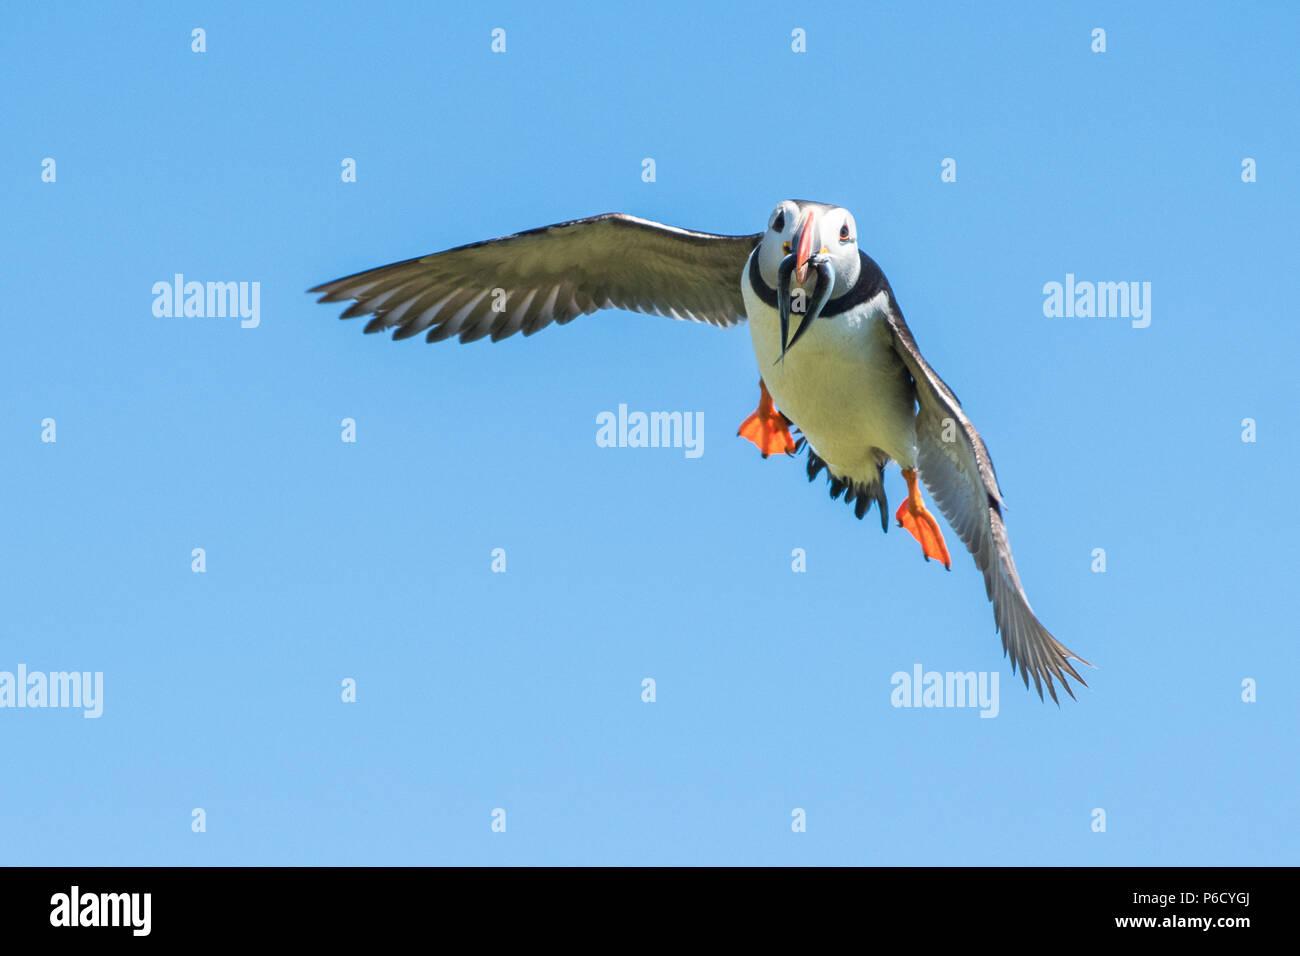 Puffin - Atlantic Puffin - flying with beak full of sand eels fish - Fratercula arctica - in flight, Isle of May, Scotland, UK Stock Photo